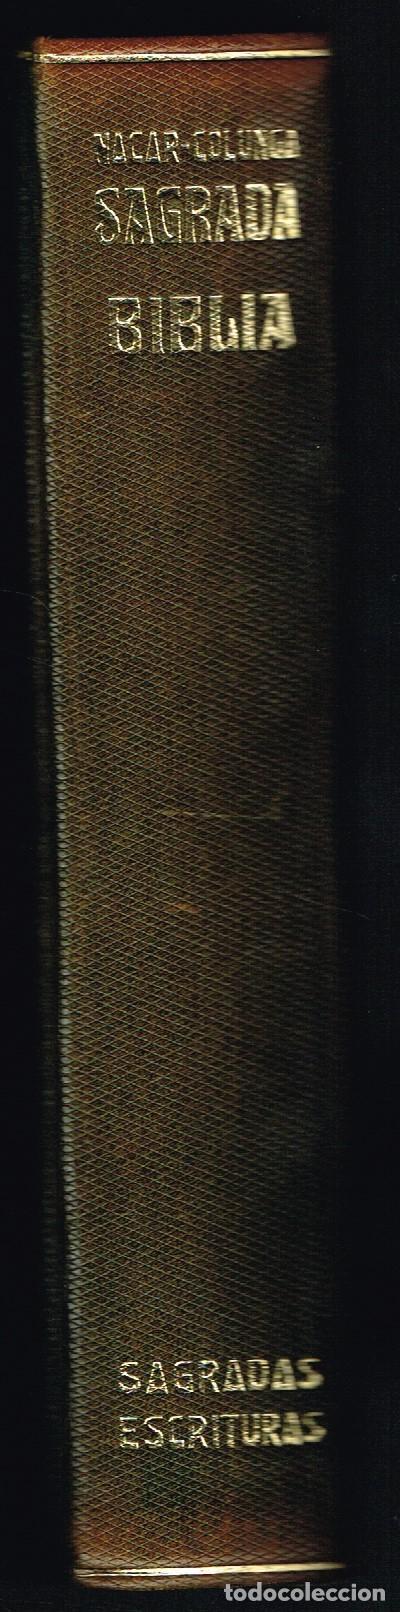 SAGRADA BIBLIA - ELOINO NÁCAR FUSTER / ALBERTO COLUNGA - 1966 - ED. LUJO - MUY BUEN ESTADO (Libros de Segunda Mano - Religión)